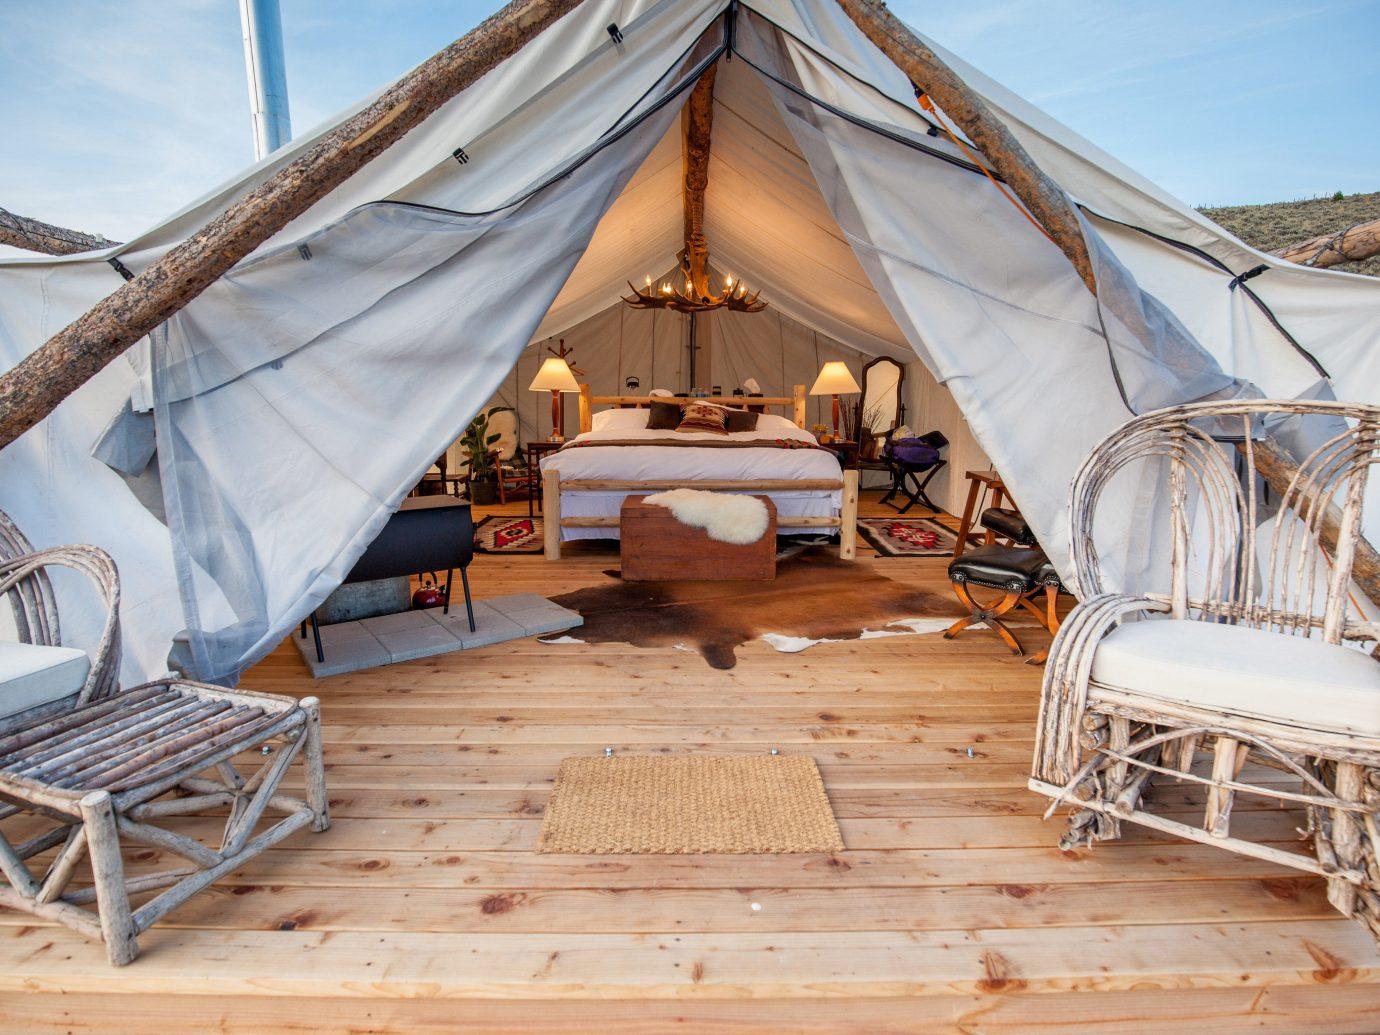 Glamping Outdoors + Adventure Weekend Getaways tent wooden cottage outdoor structure hut estate Resort Villa